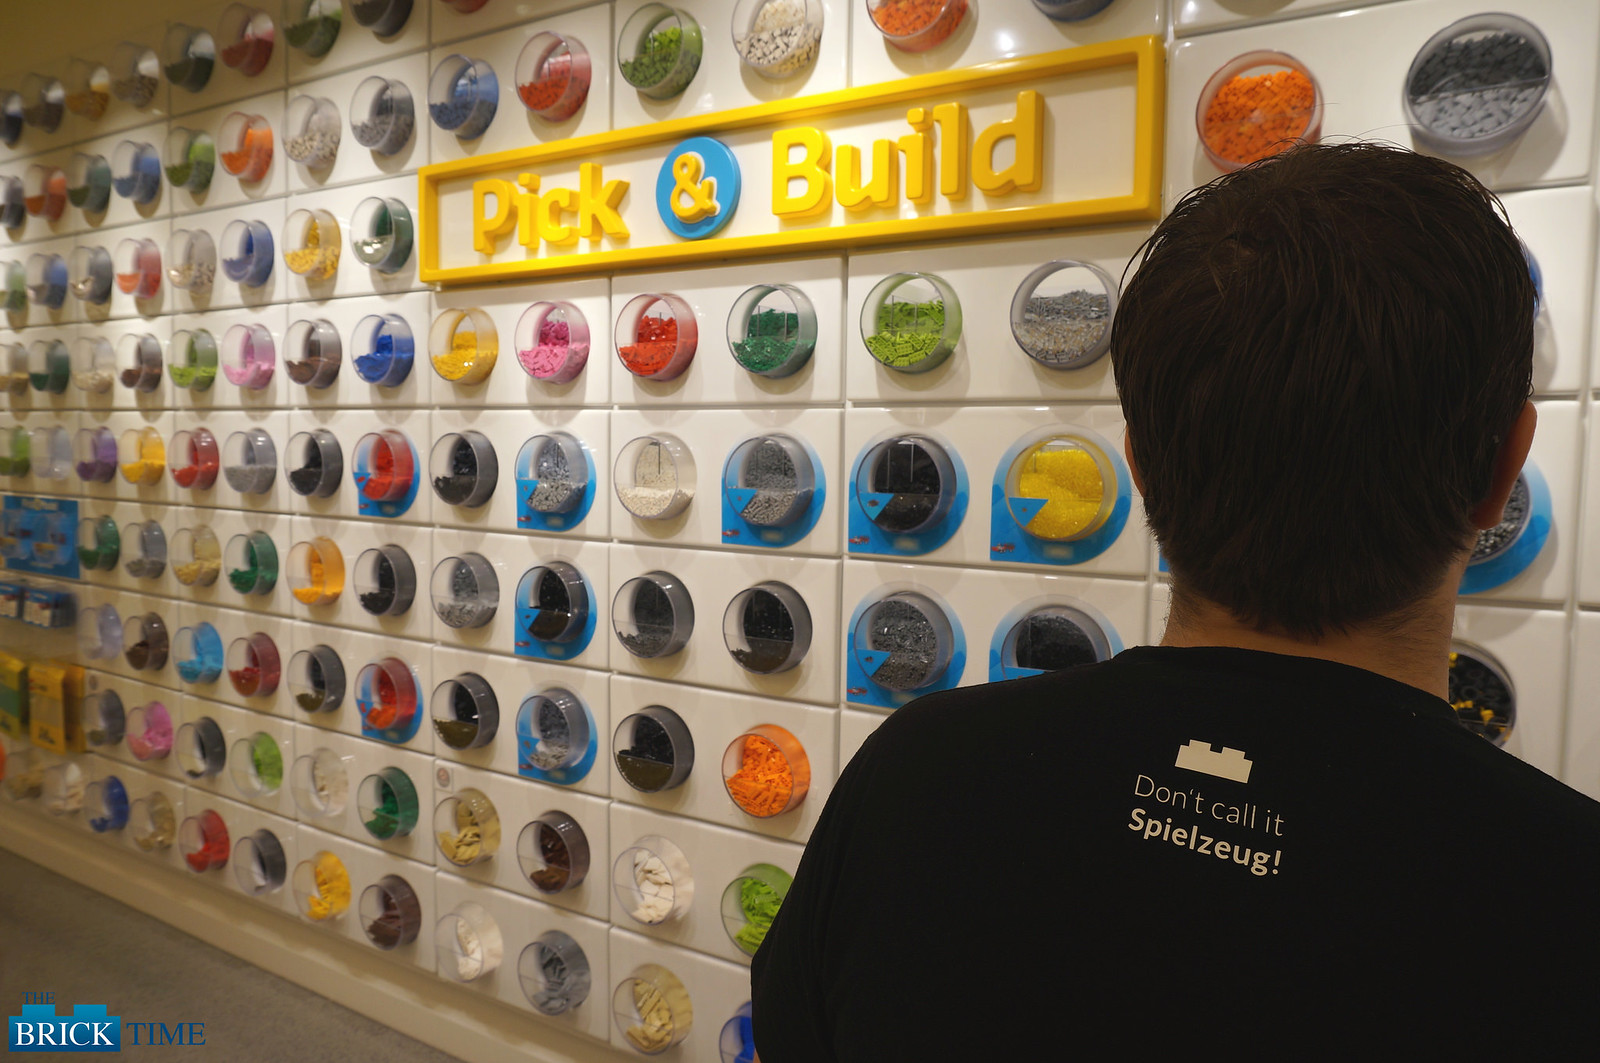 LEGO Store Berlin - PickaBrick